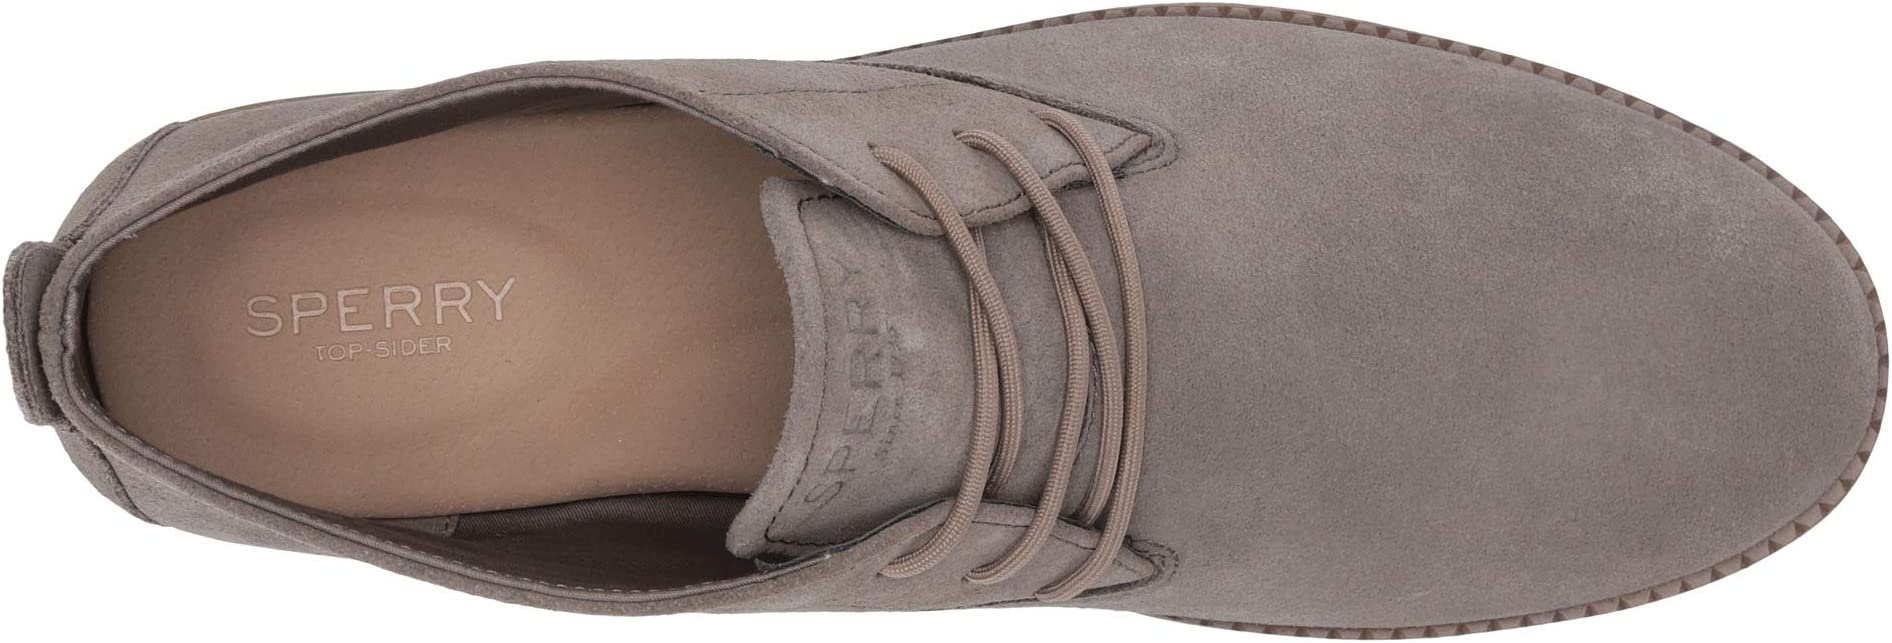 Sperry Waypoint Desert Bootie   Women's shoes   2020 Newest